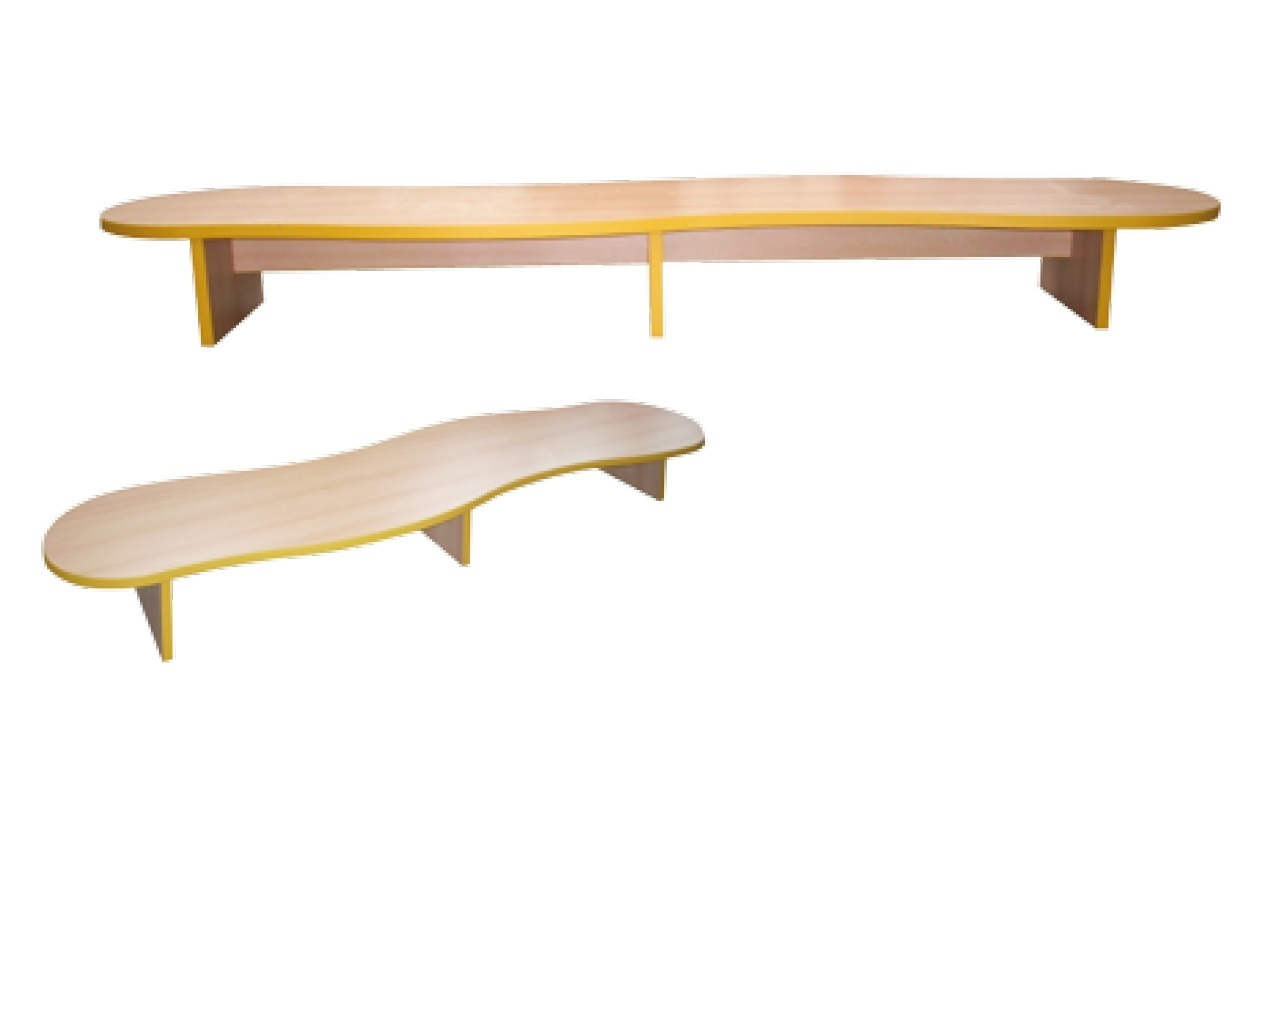 kita bonn sitzbank welle 240 x 35 x 50 cm. Black Bedroom Furniture Sets. Home Design Ideas